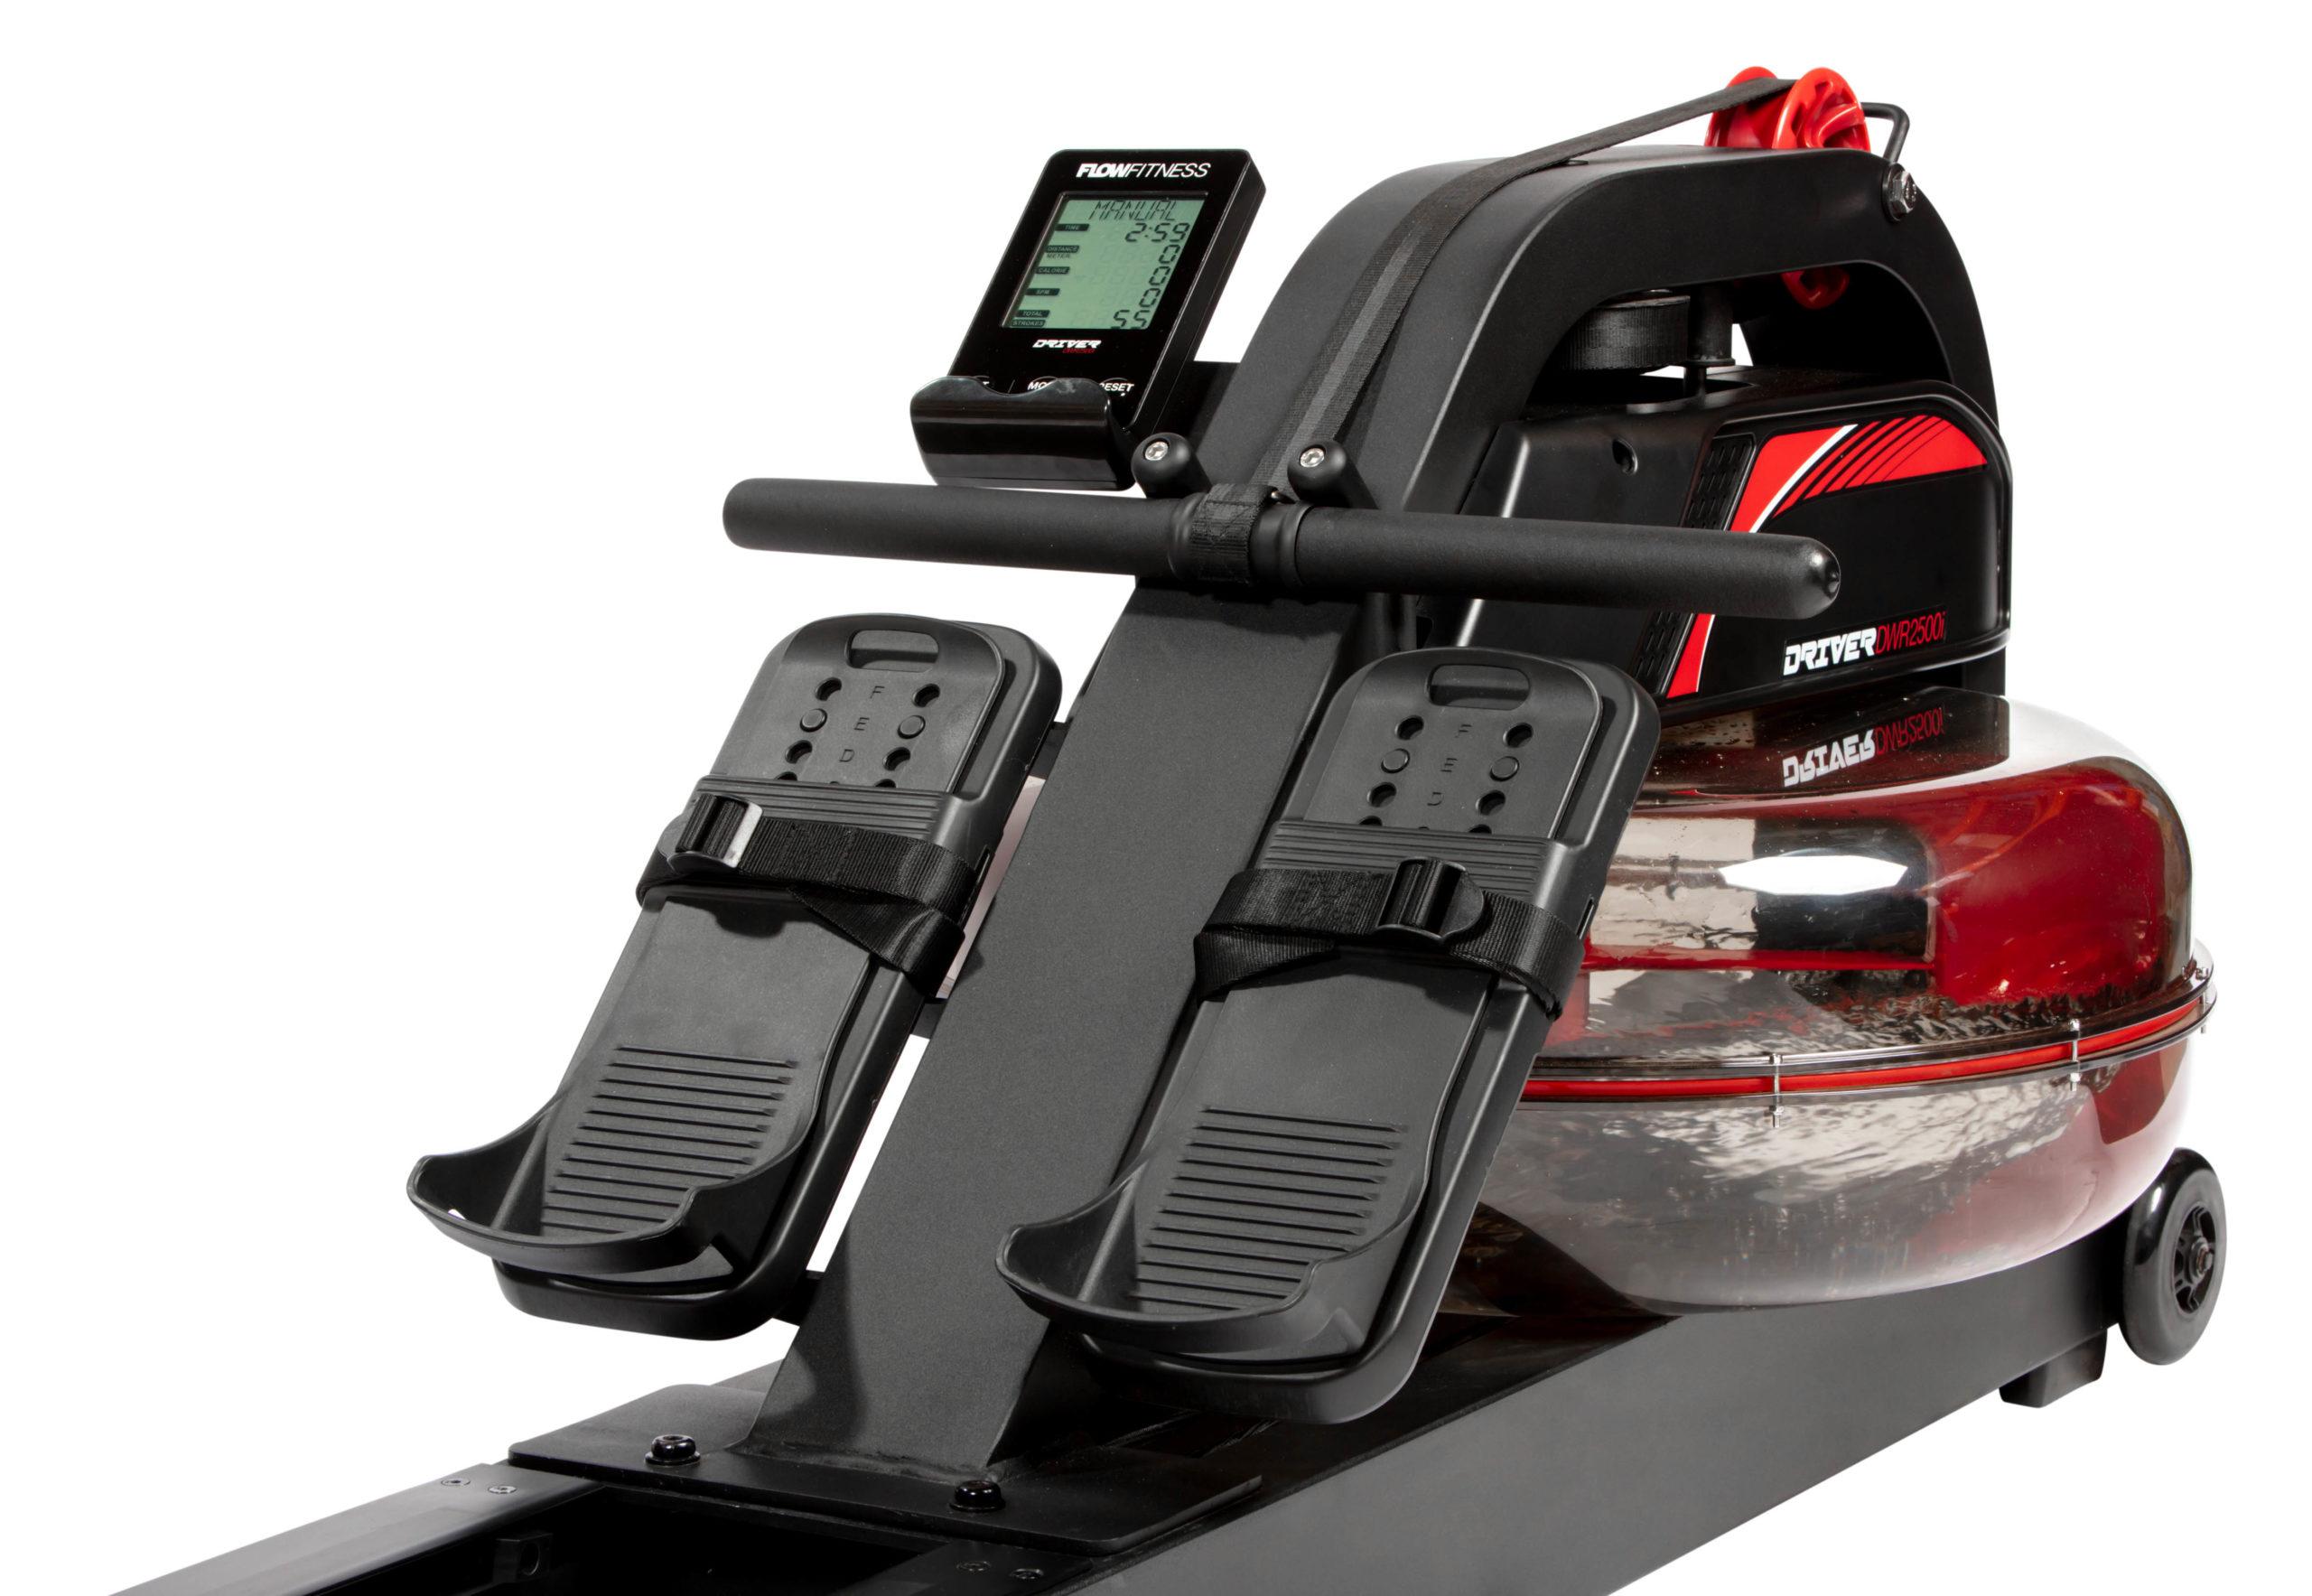 Flow Fitness Tabel Driver DWR2500i 7